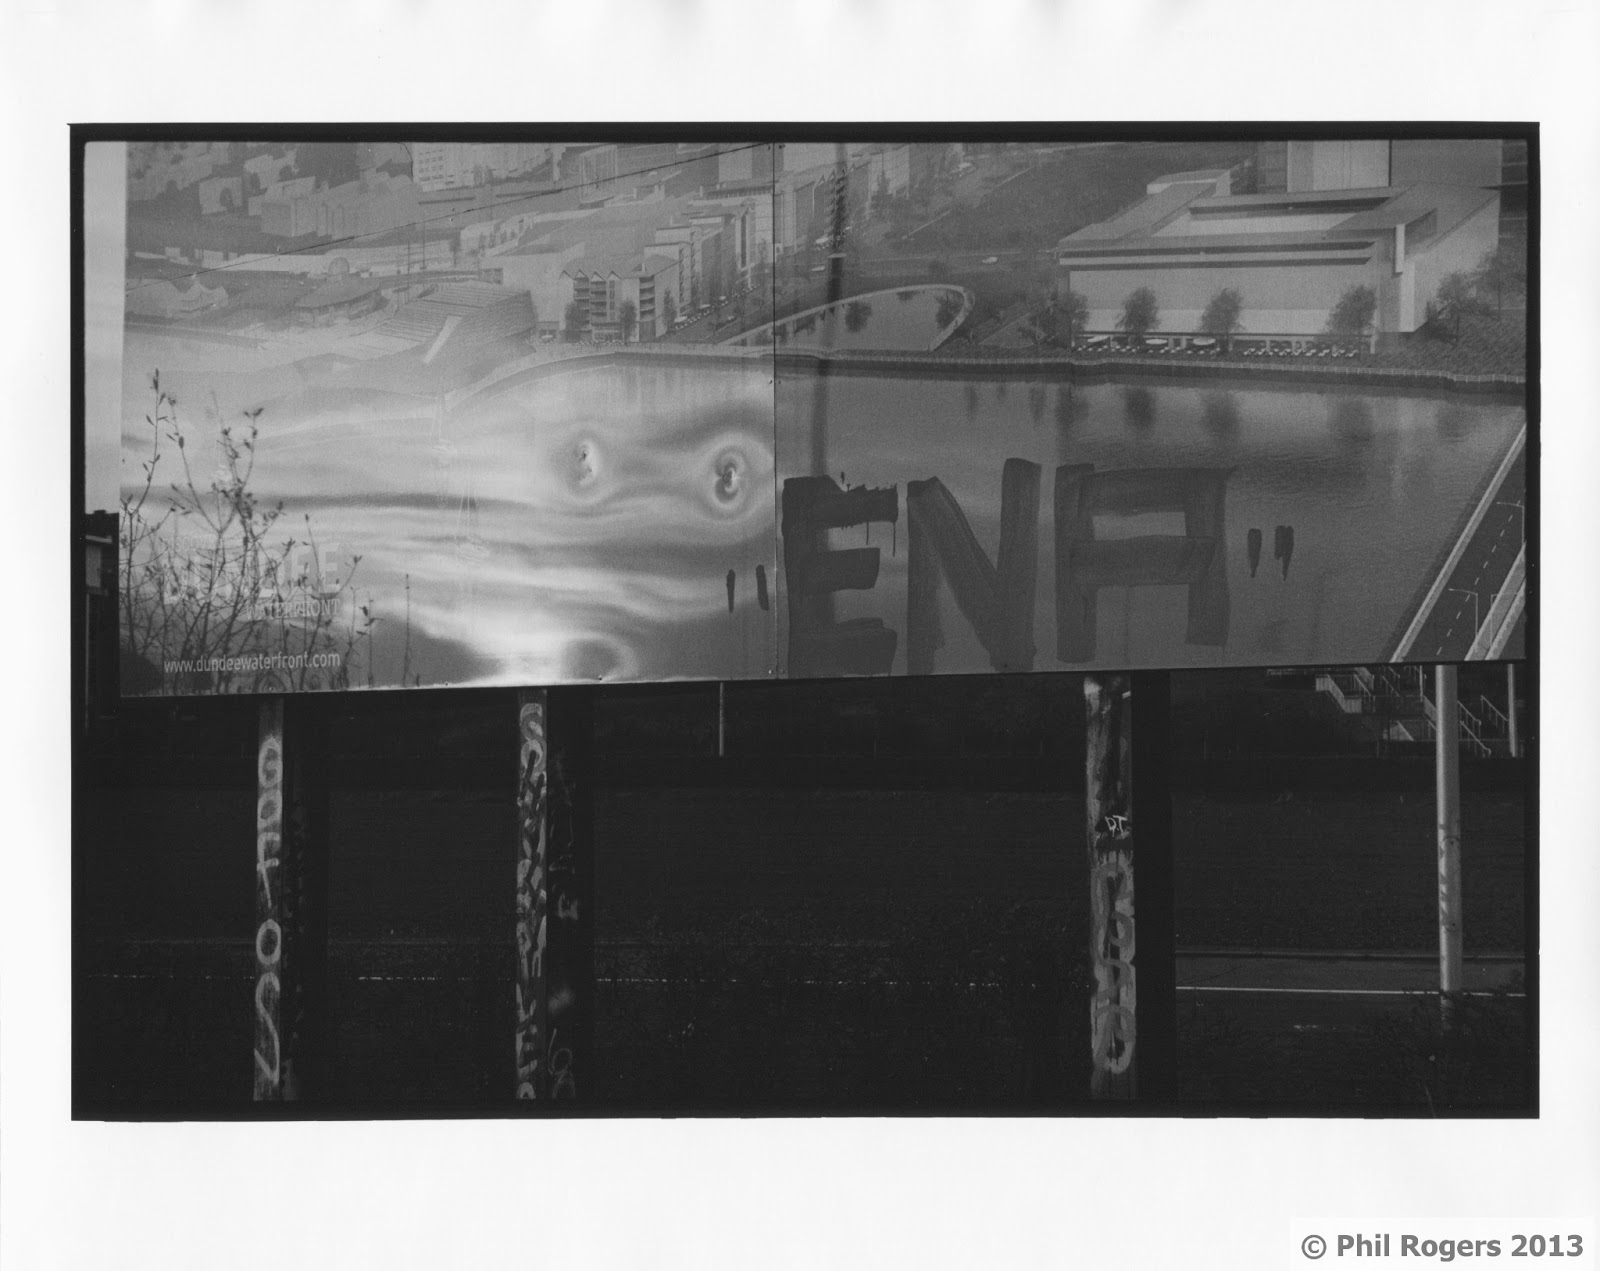 Kodak TMY2 400, Kentmere Fineprint VC Glossy